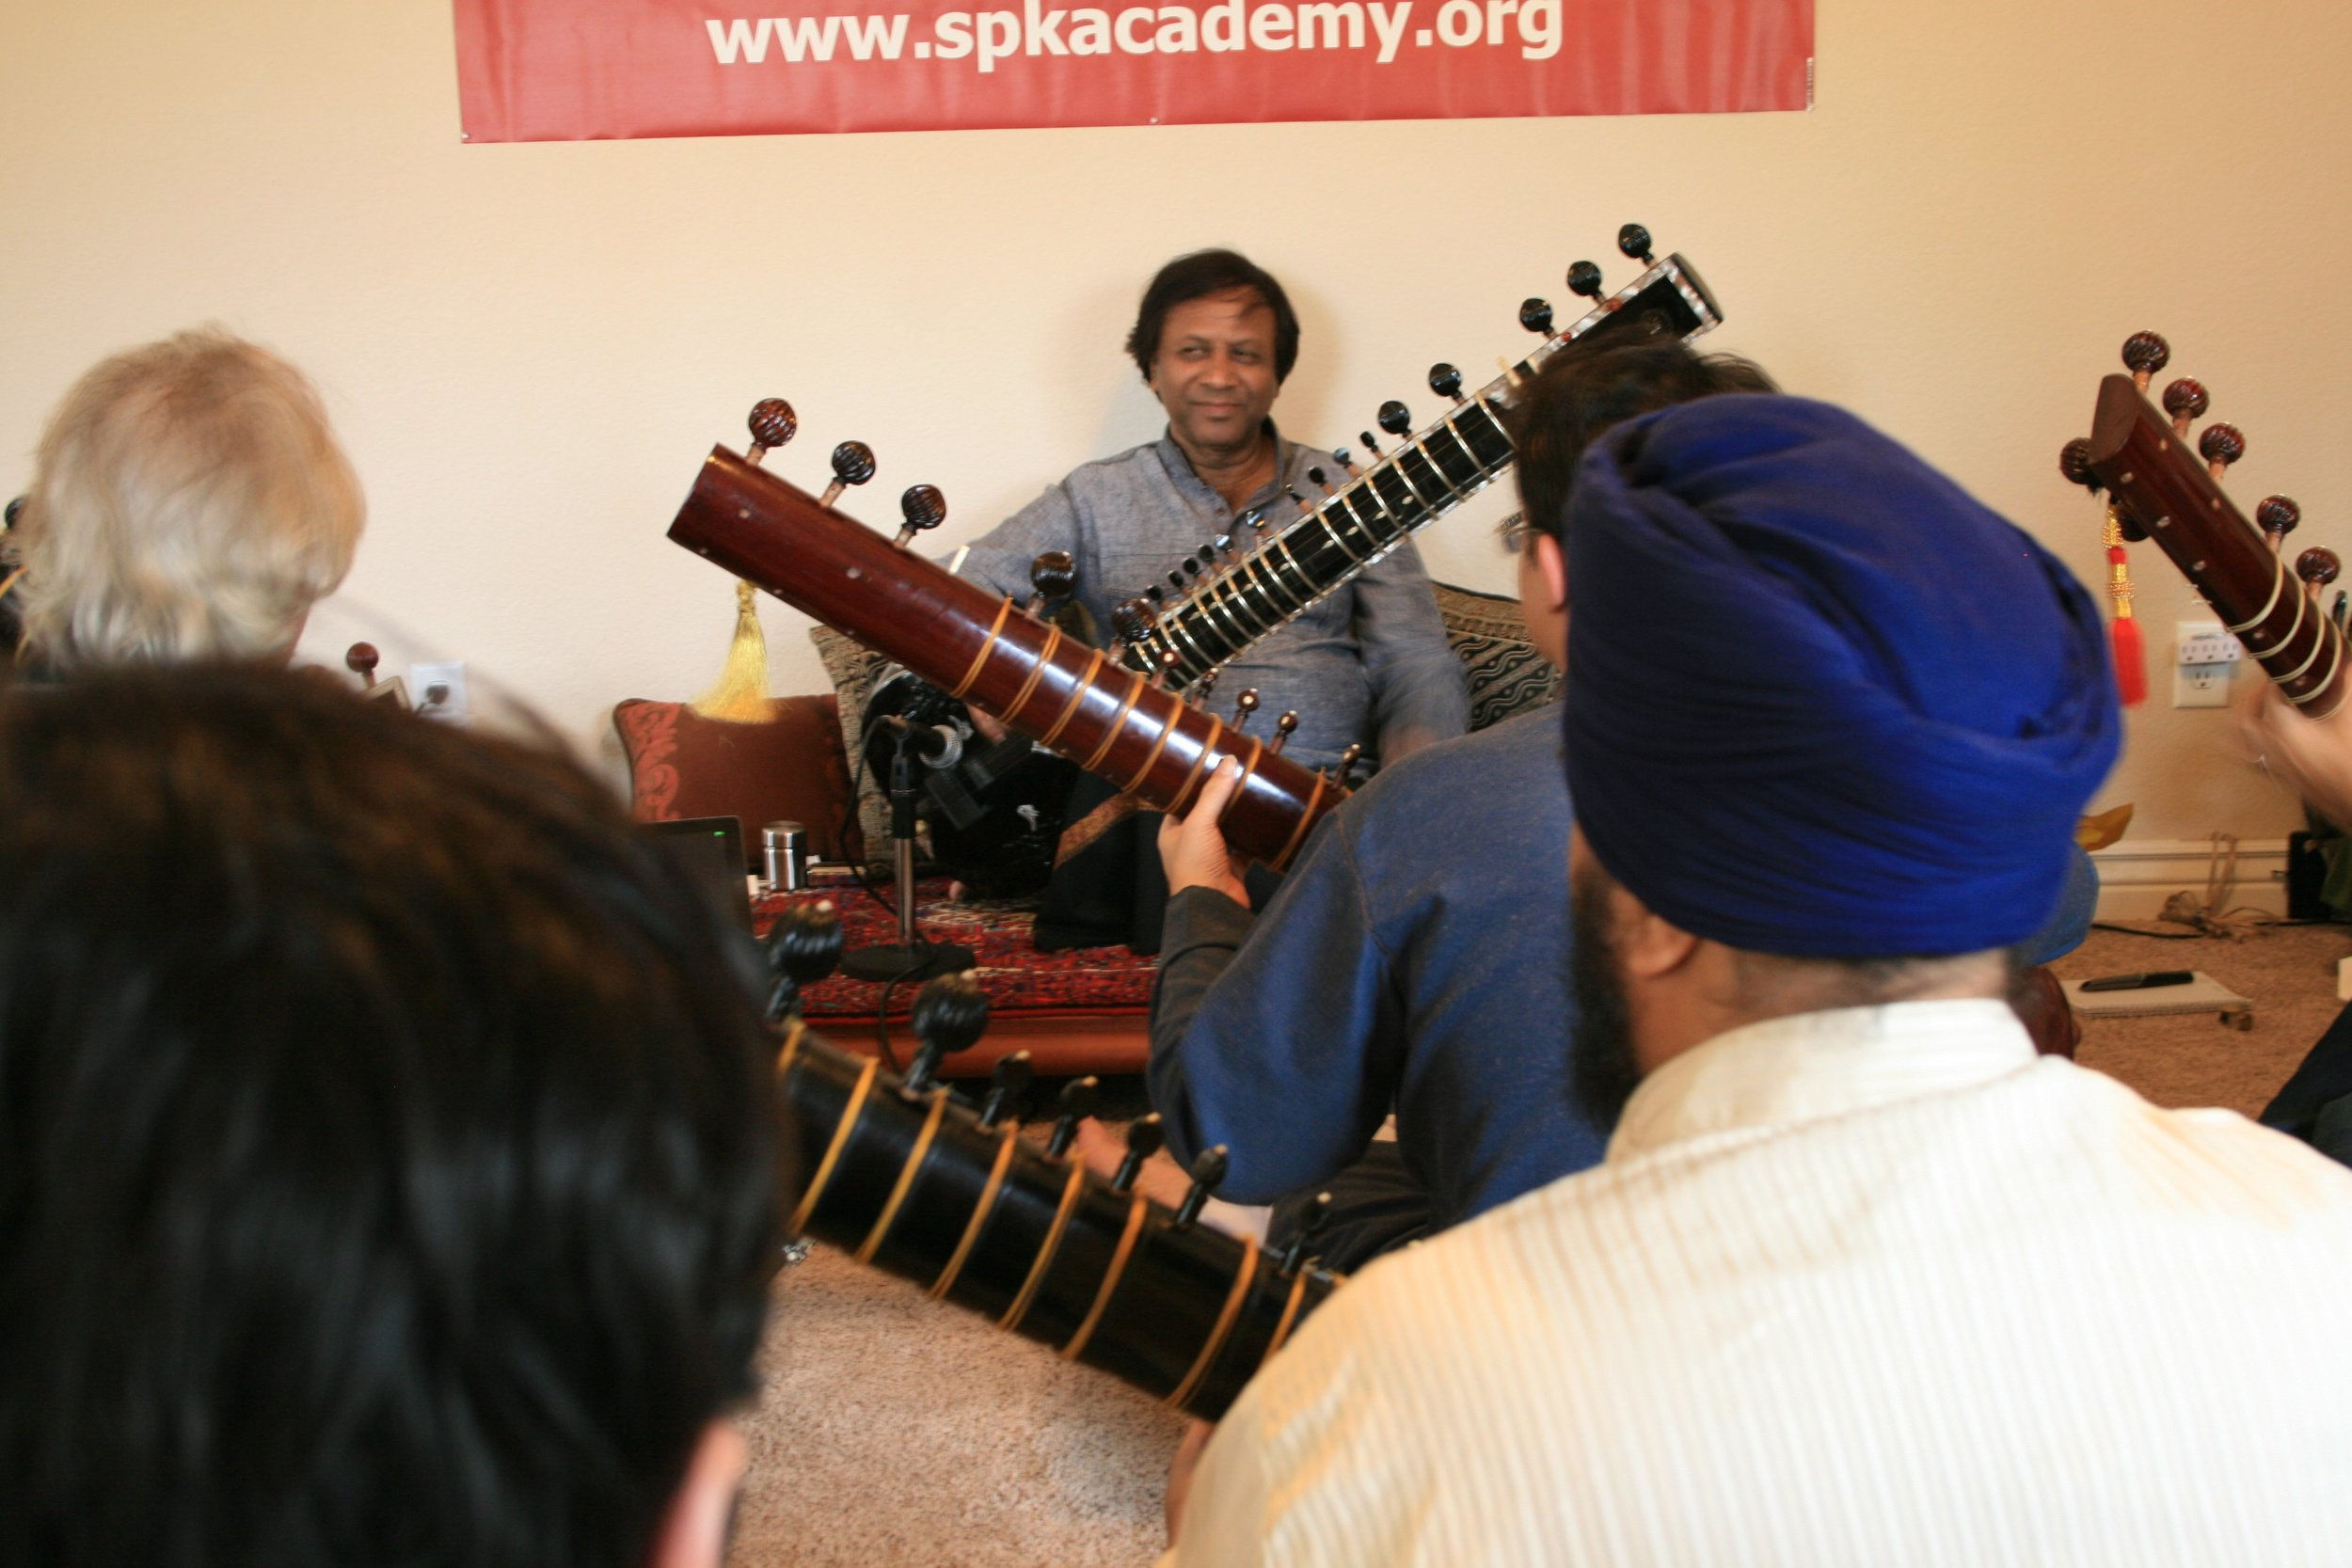 spk-academy-6.jpg